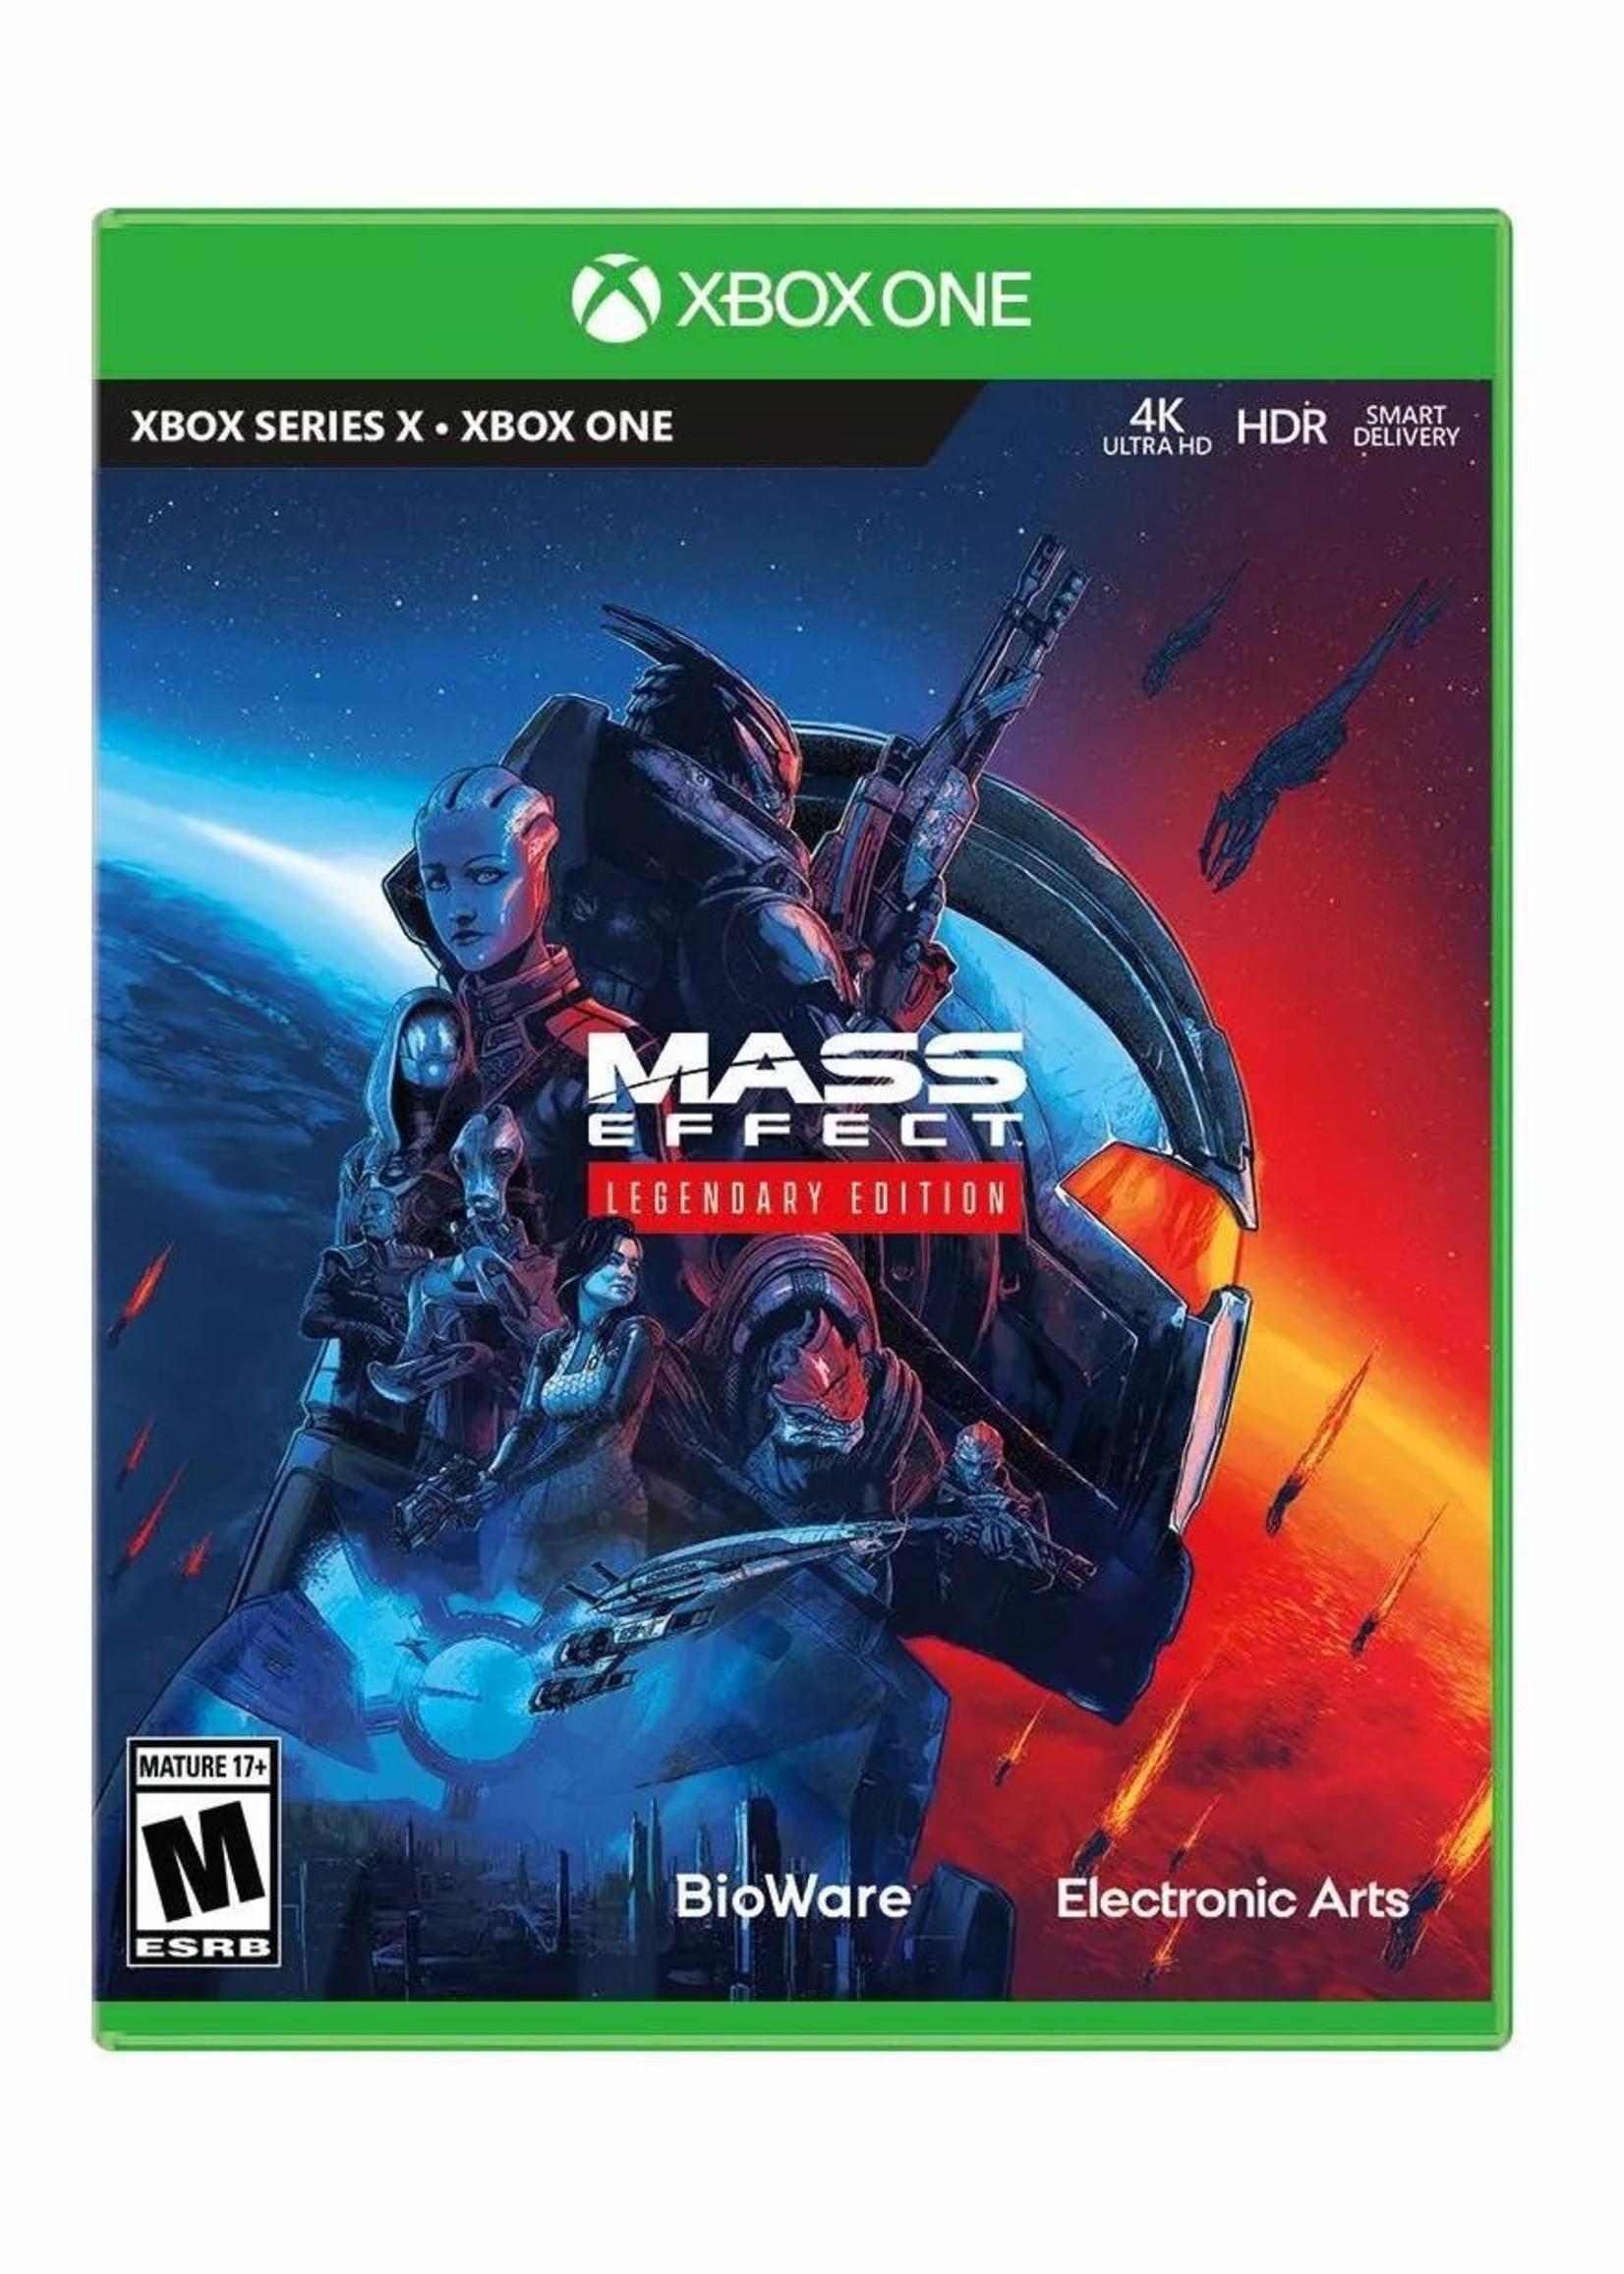 Mass Effect: Legendary Edition - XBOne NEW